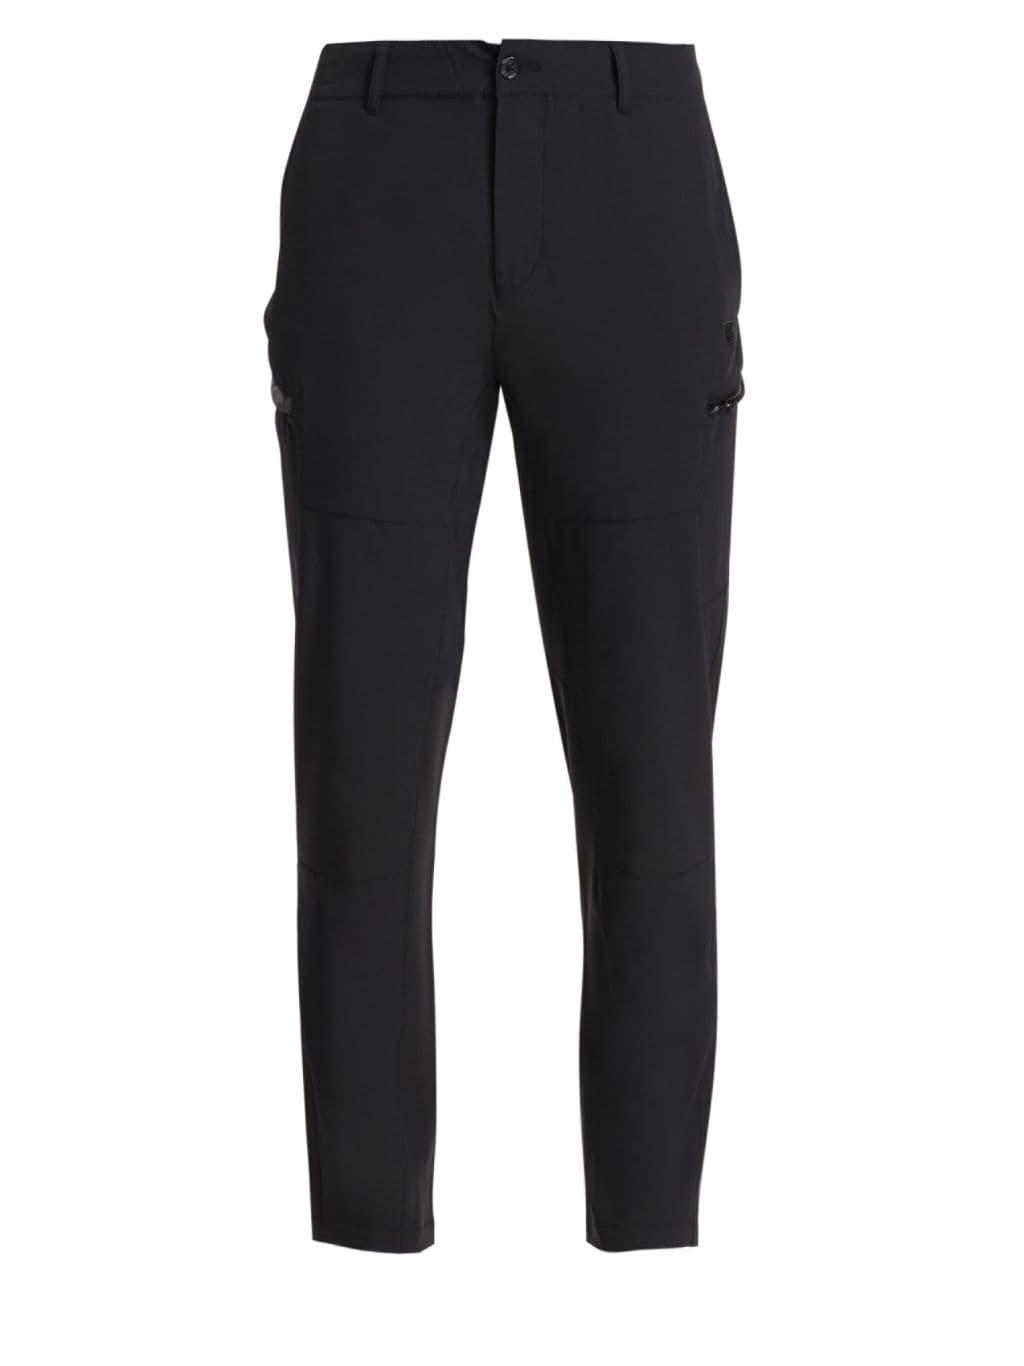 Madison Supply Zipper Woven Pants